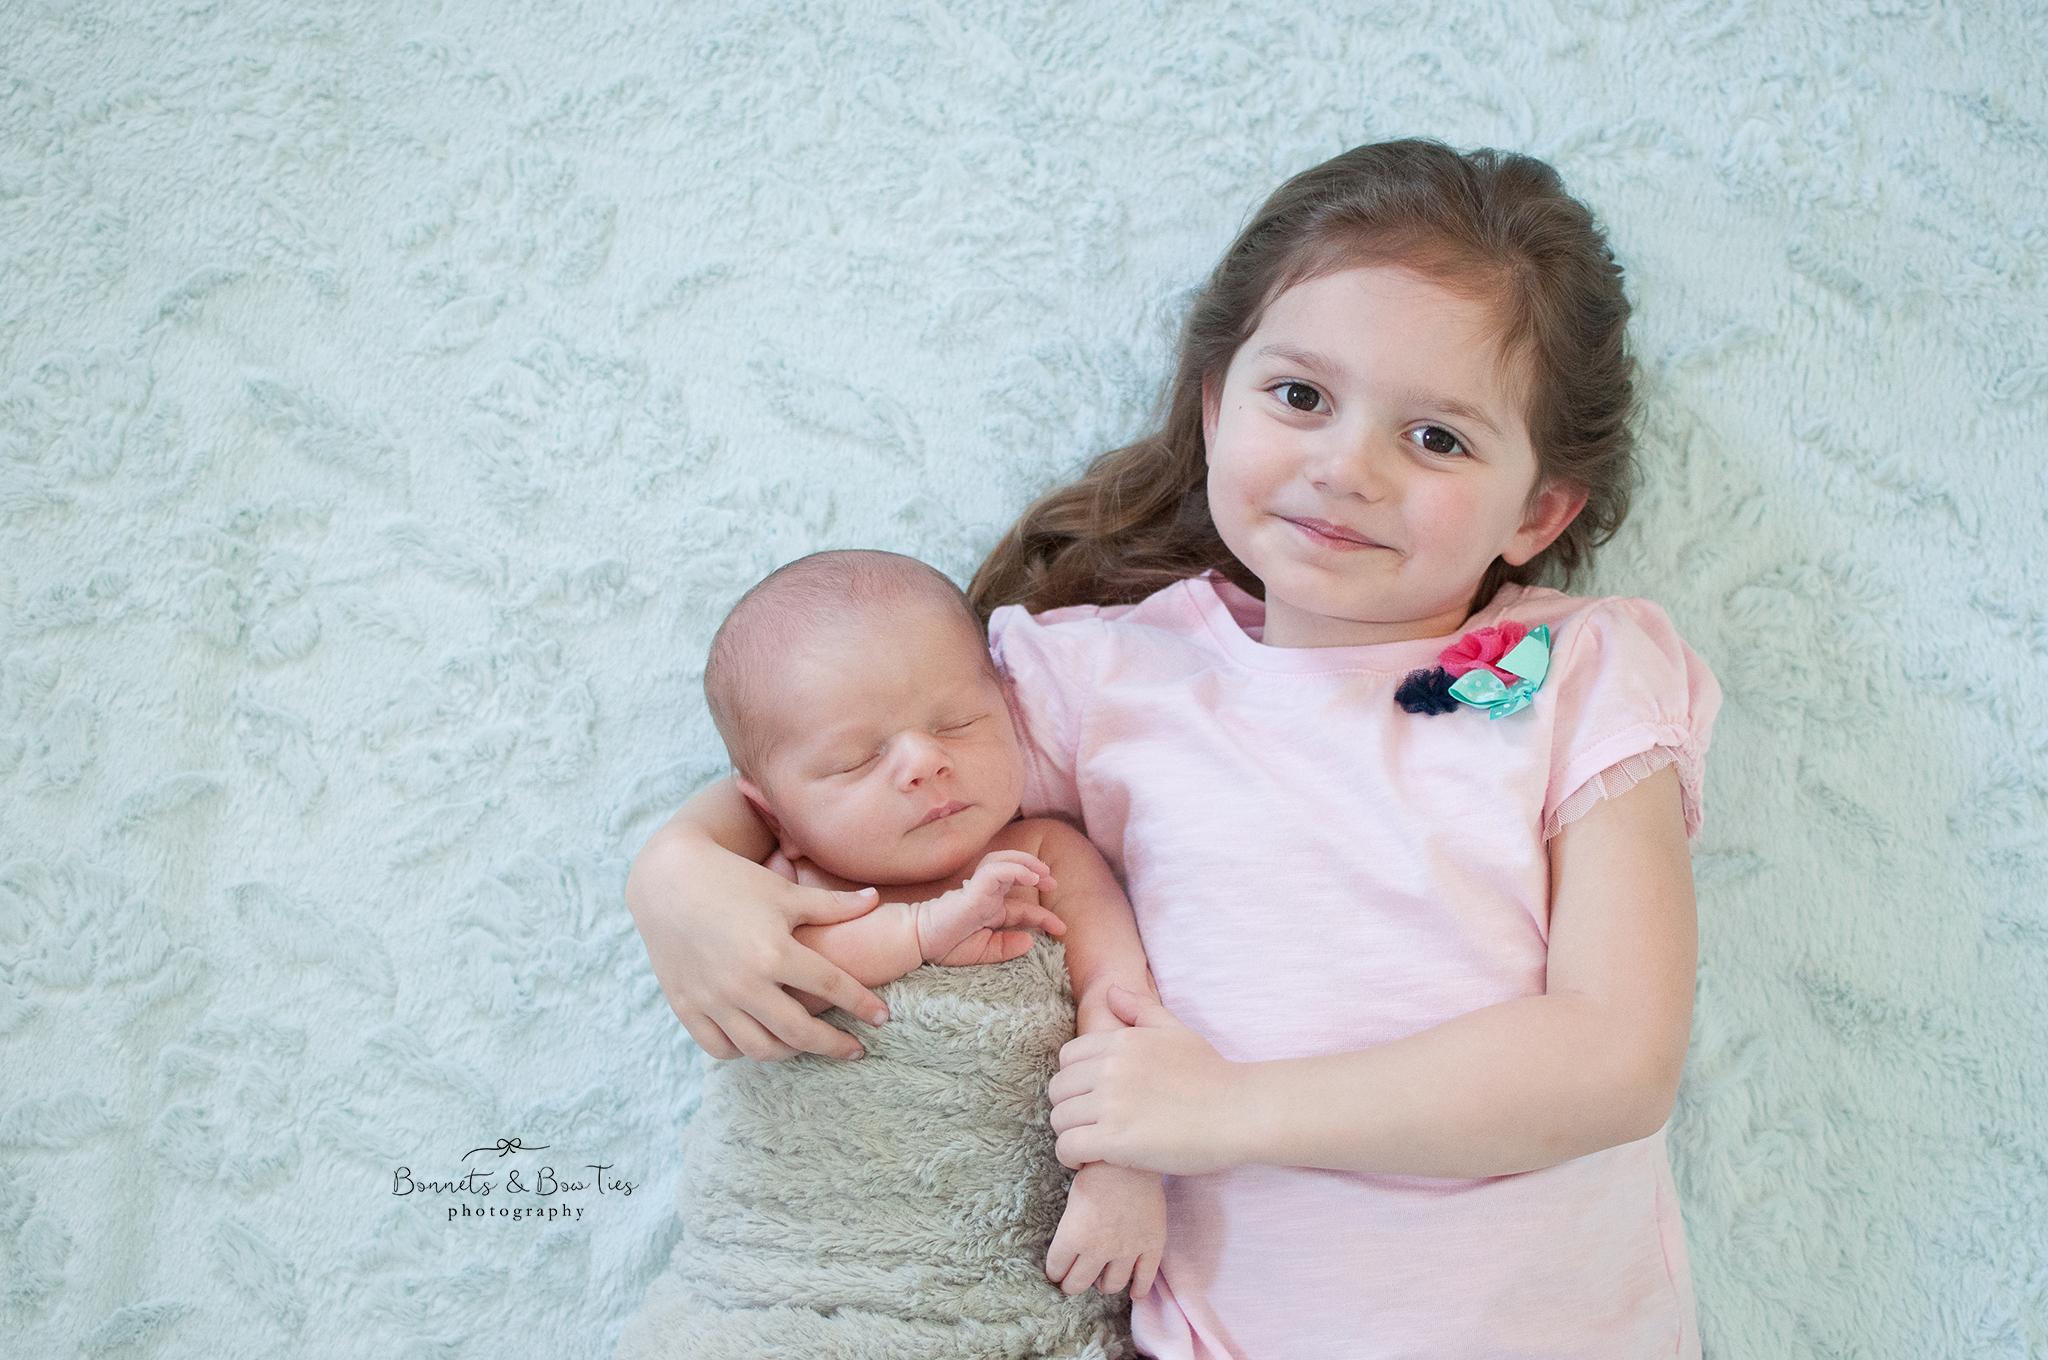 newborn photographer york haven pa.jpg